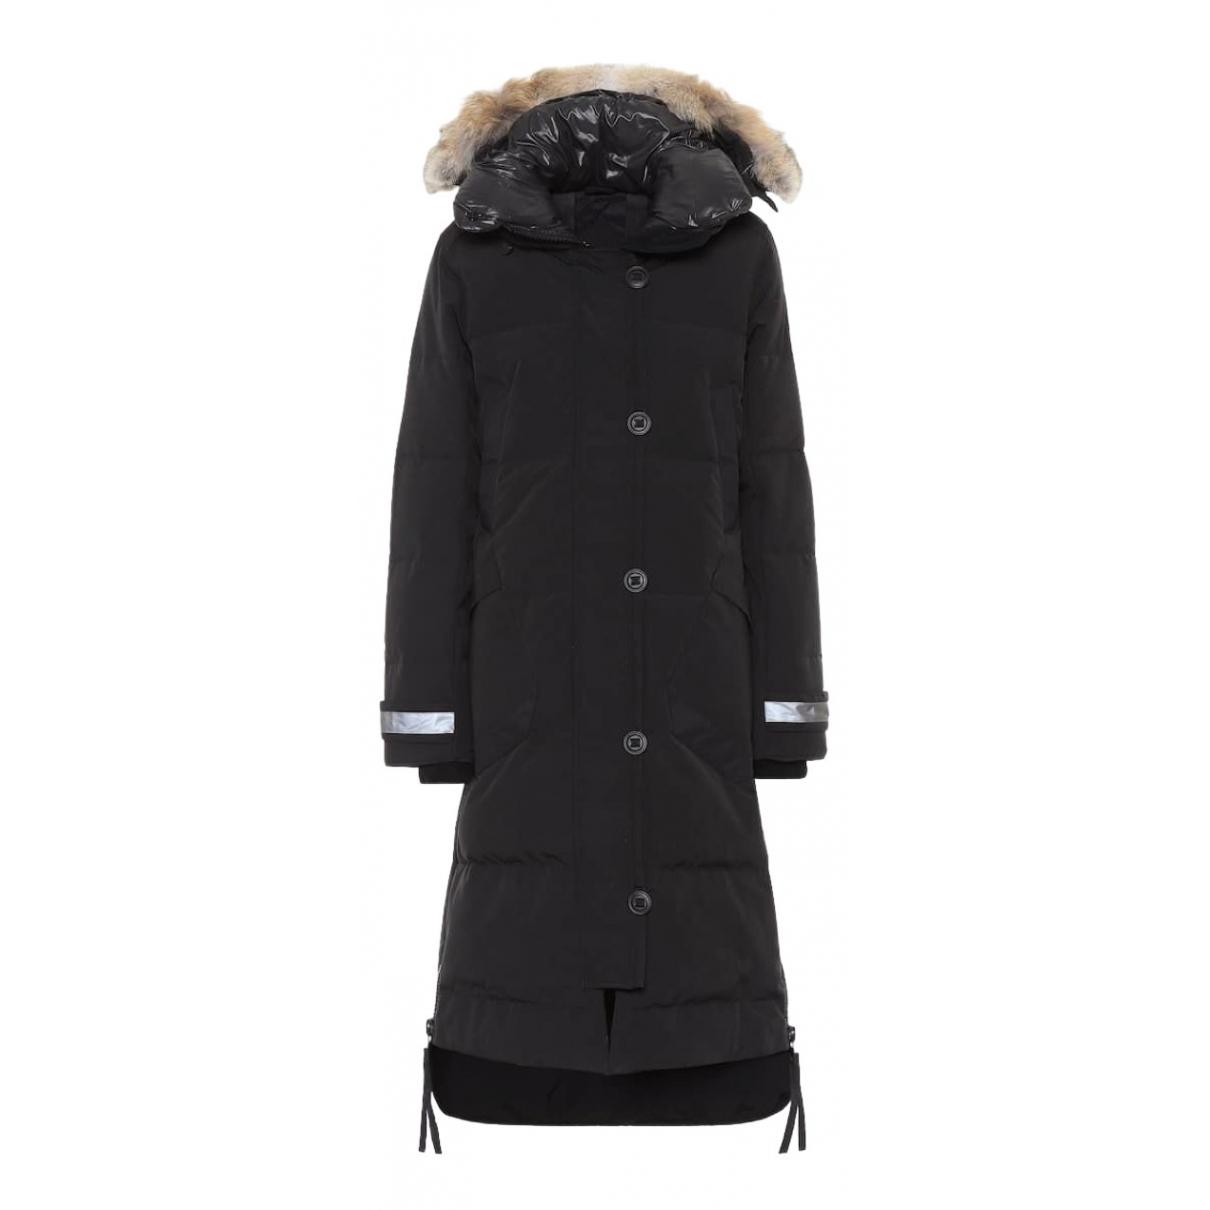 Canada Goose \N Black Cotton jacket for Women S International